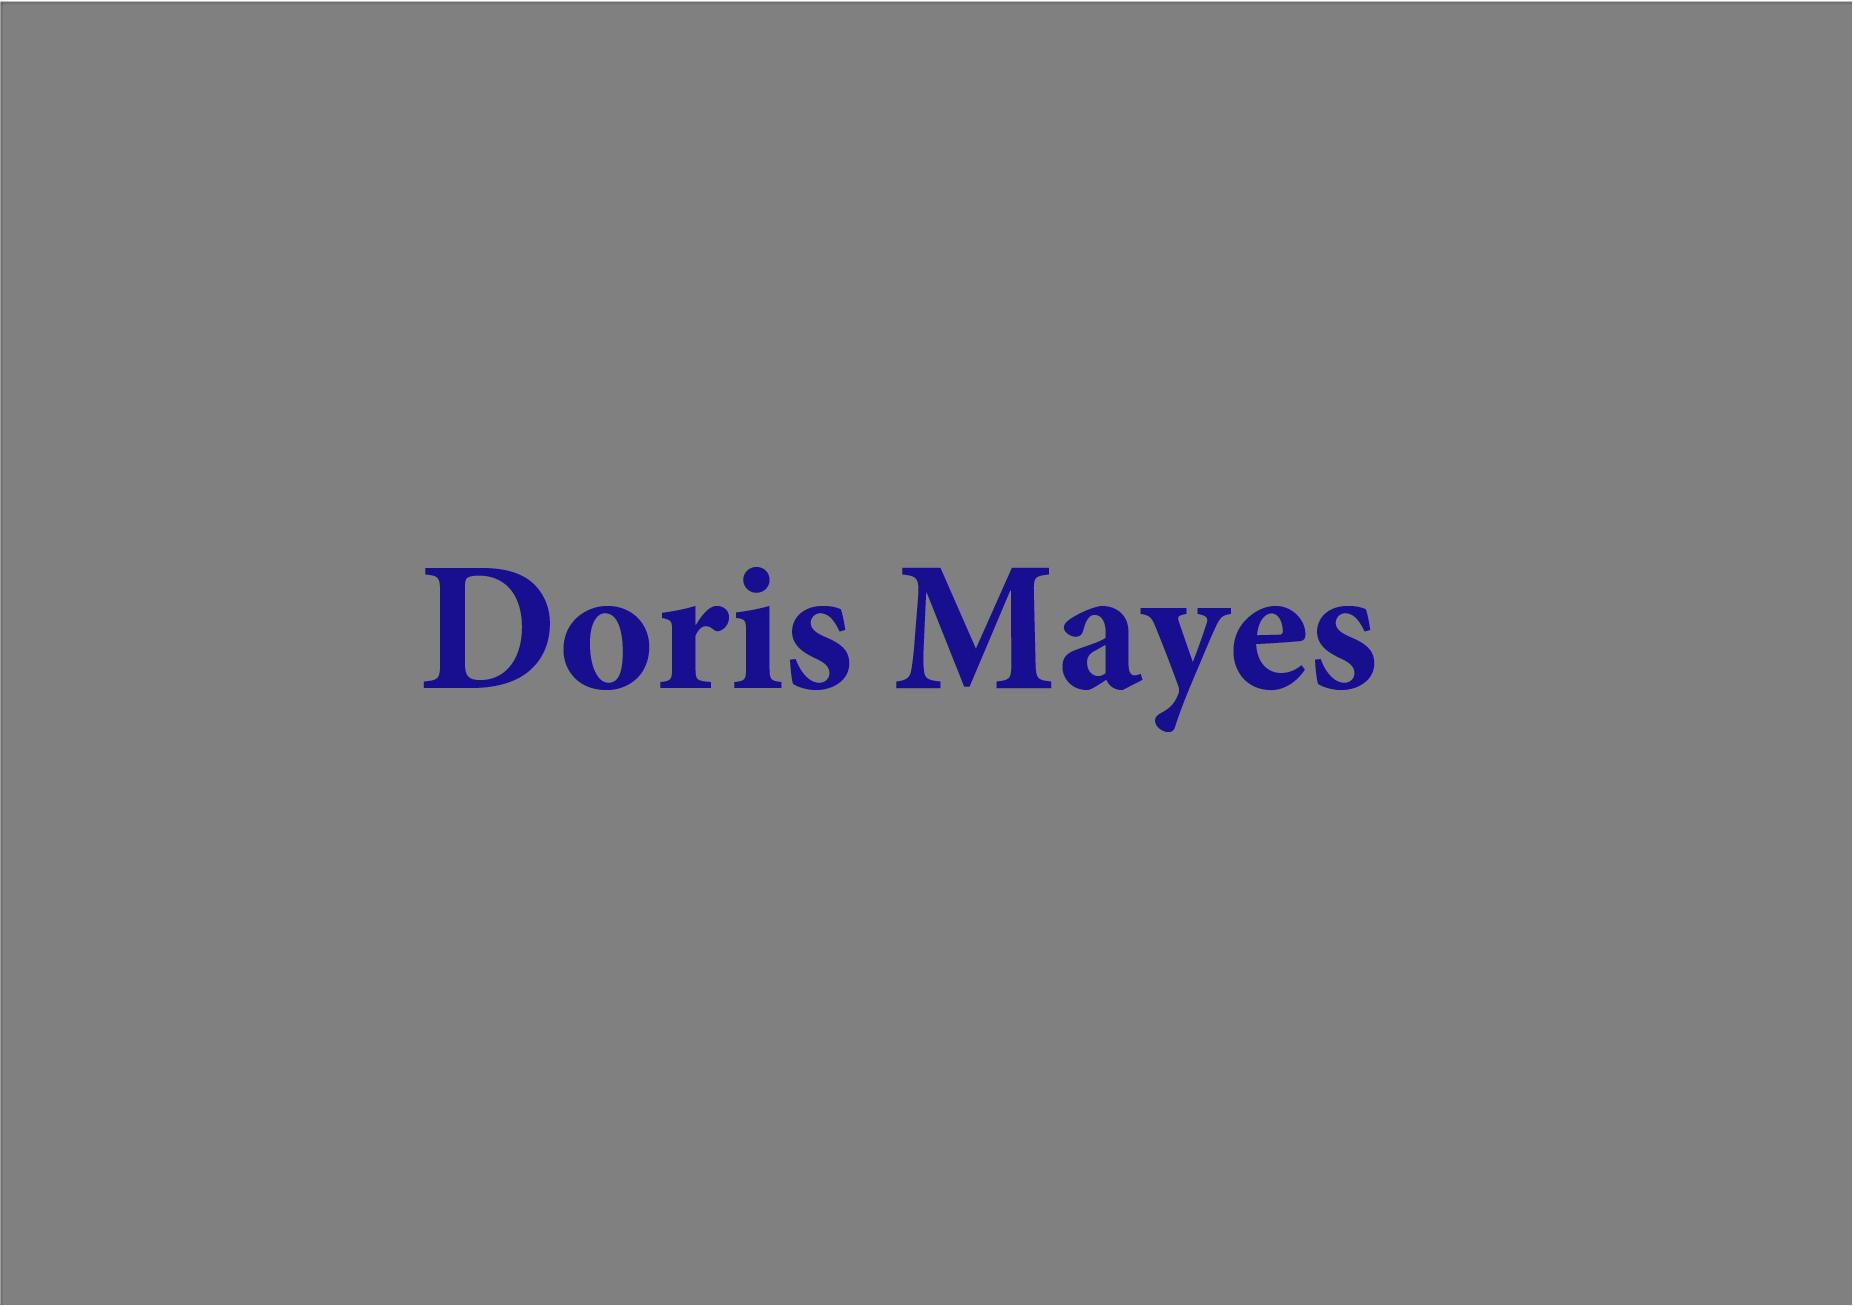 doris mayes.png